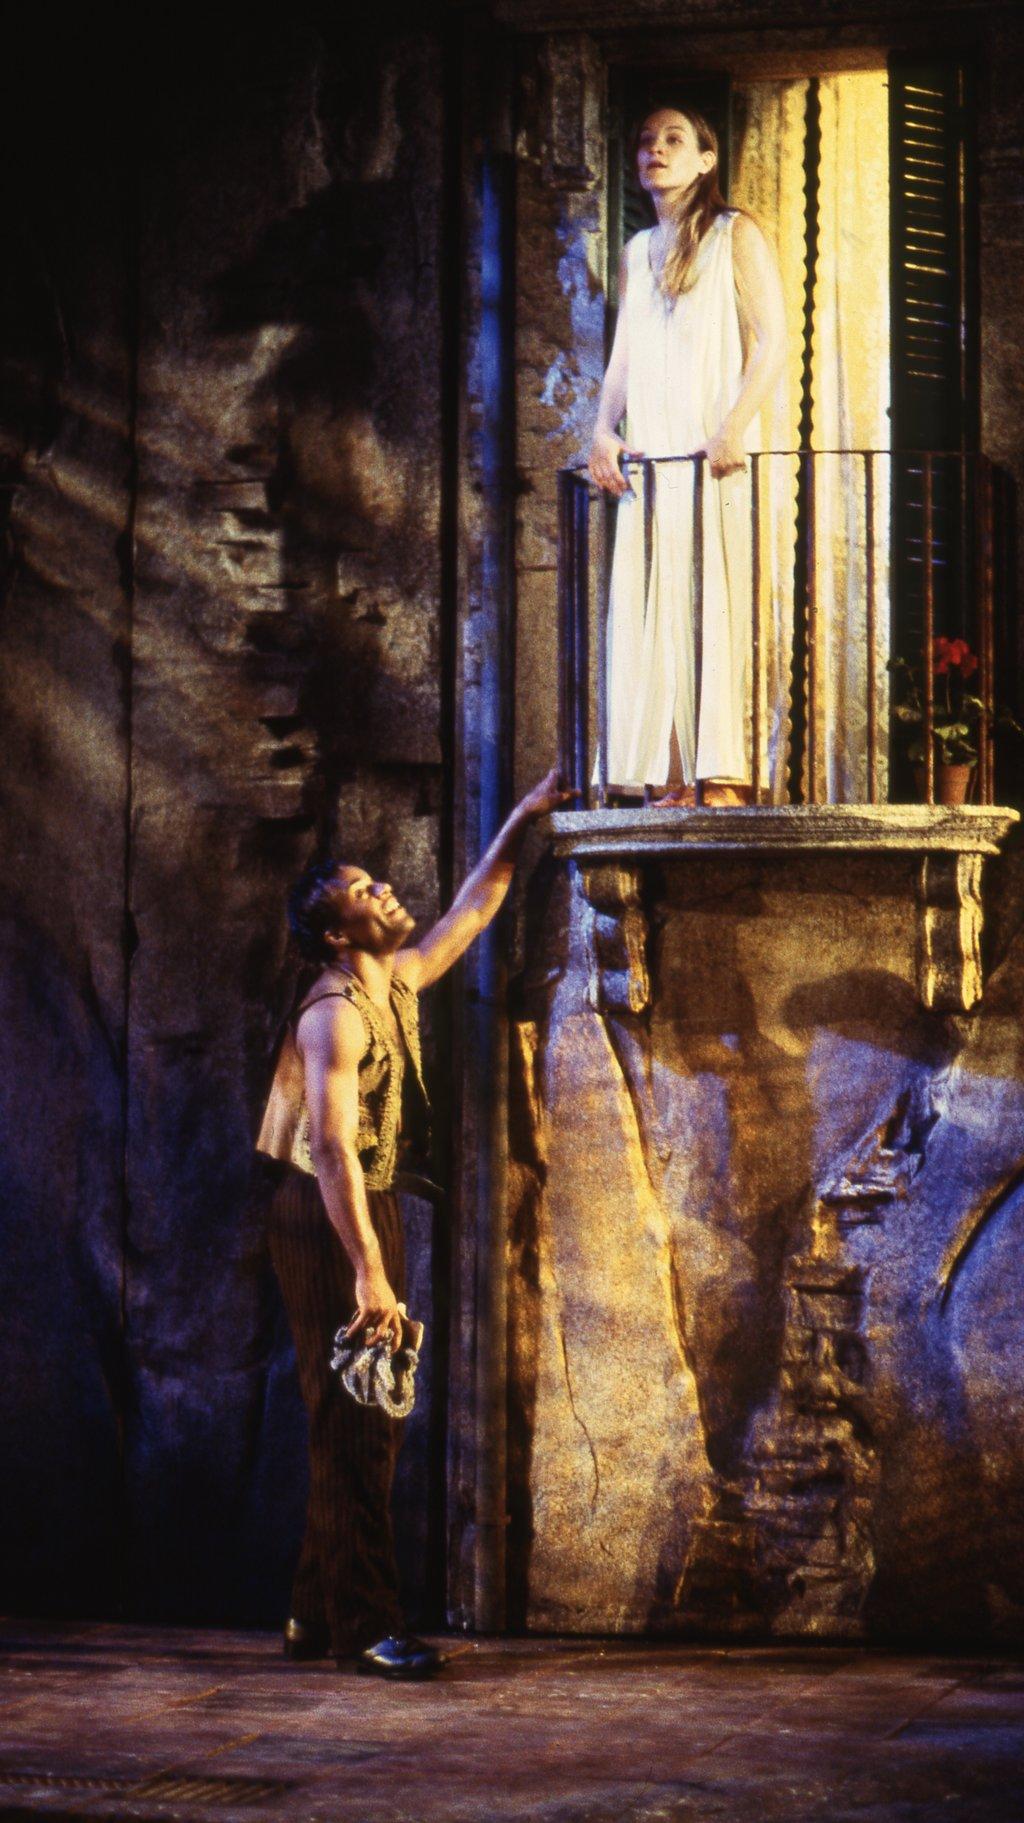 Romeo and juliet scene Nude Photos 58